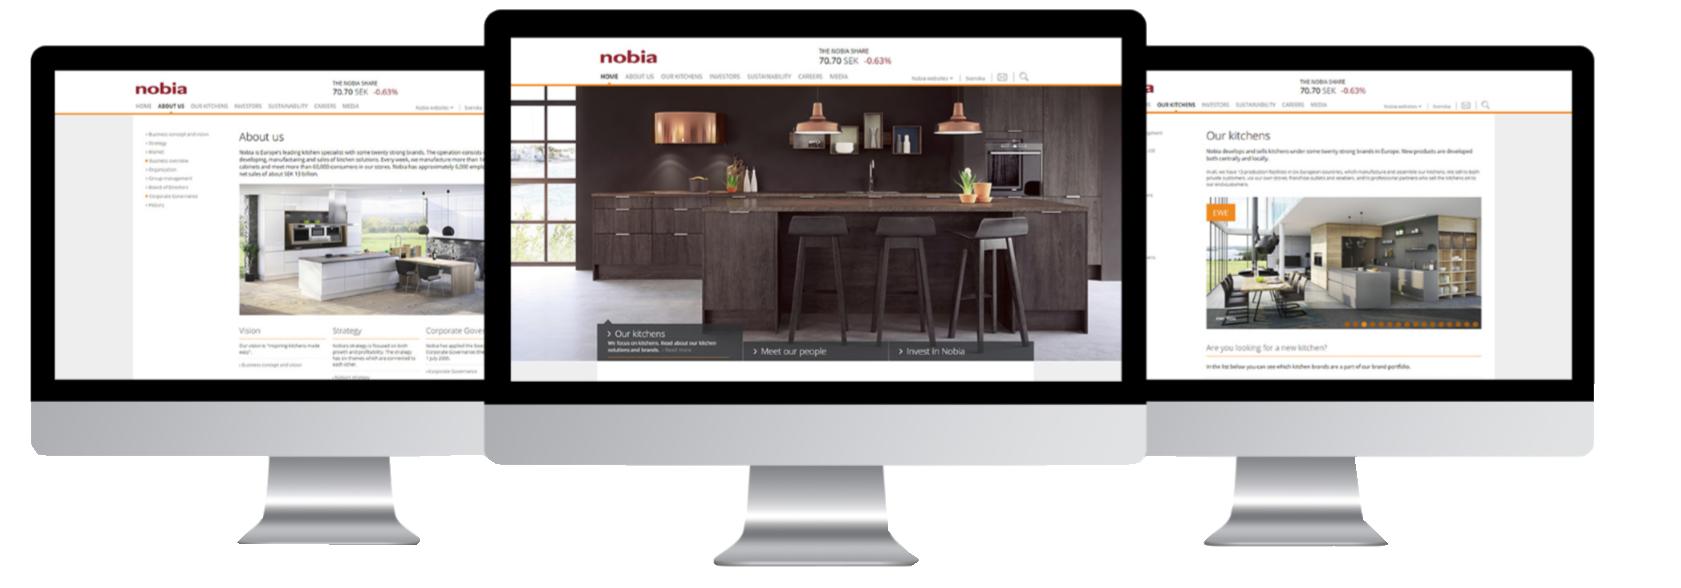 Nobia UK Website-1